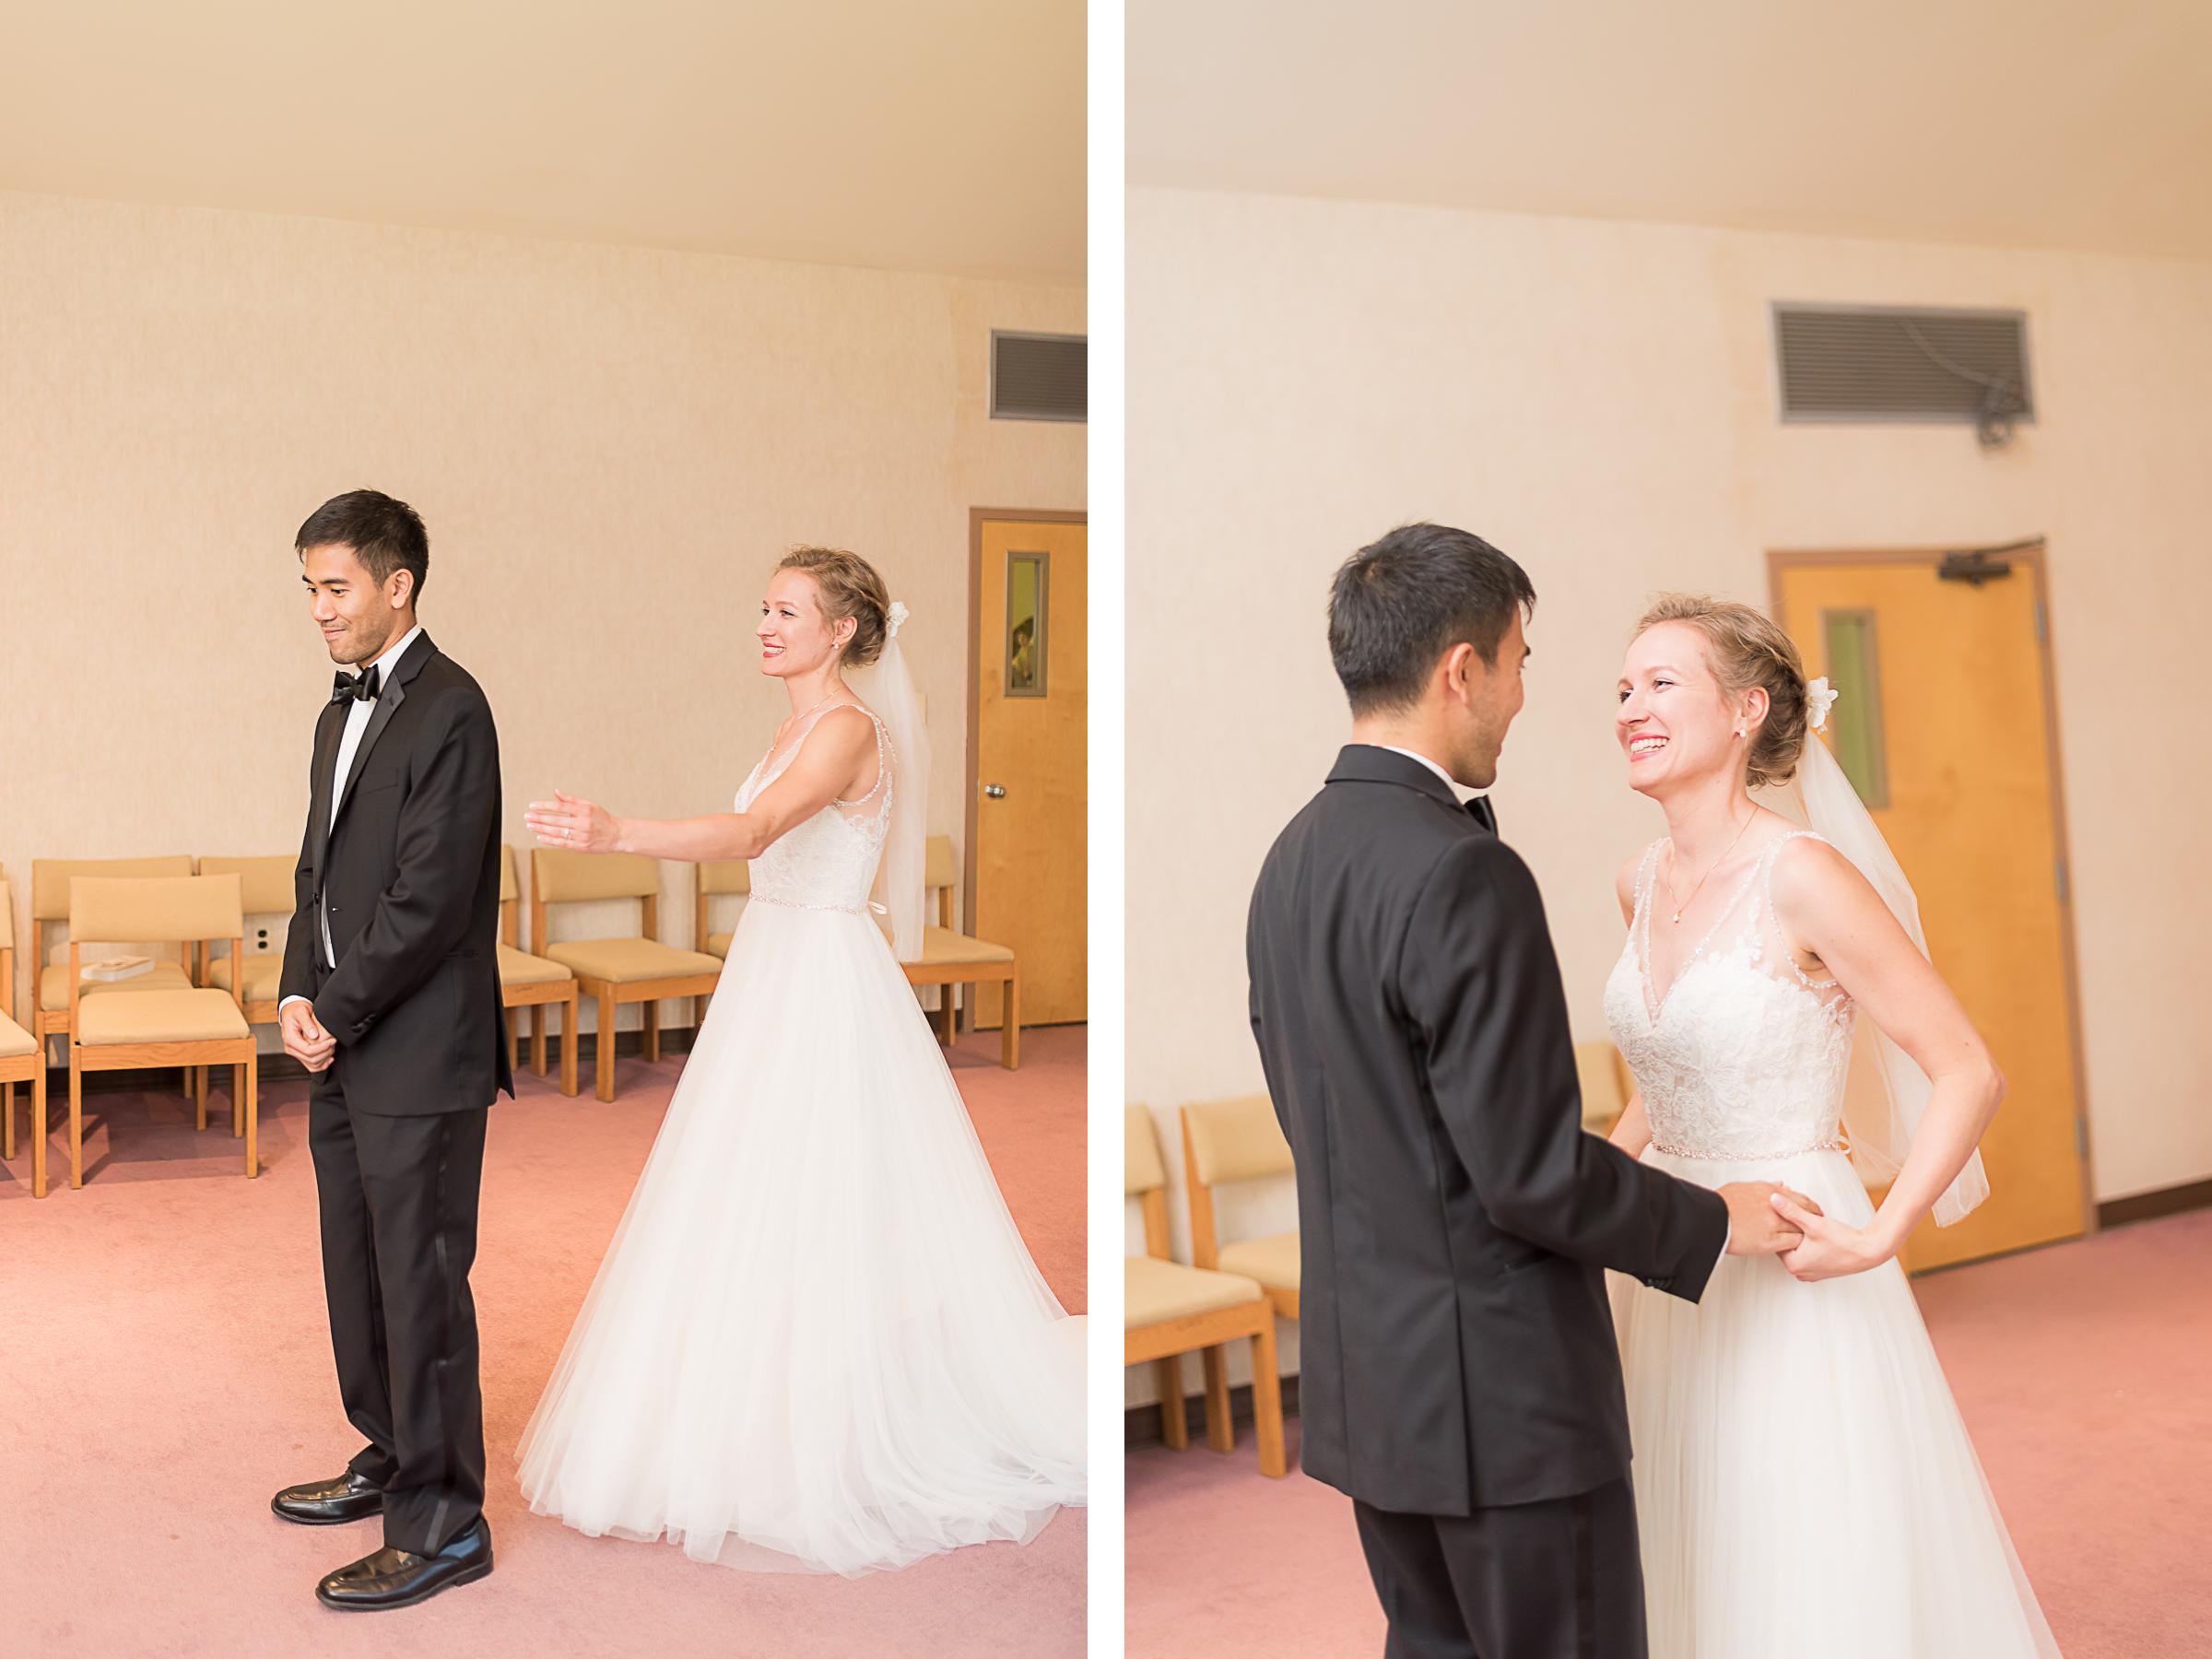 Elkridge-Furnace-Inn-Wedding-First-Look-Groom